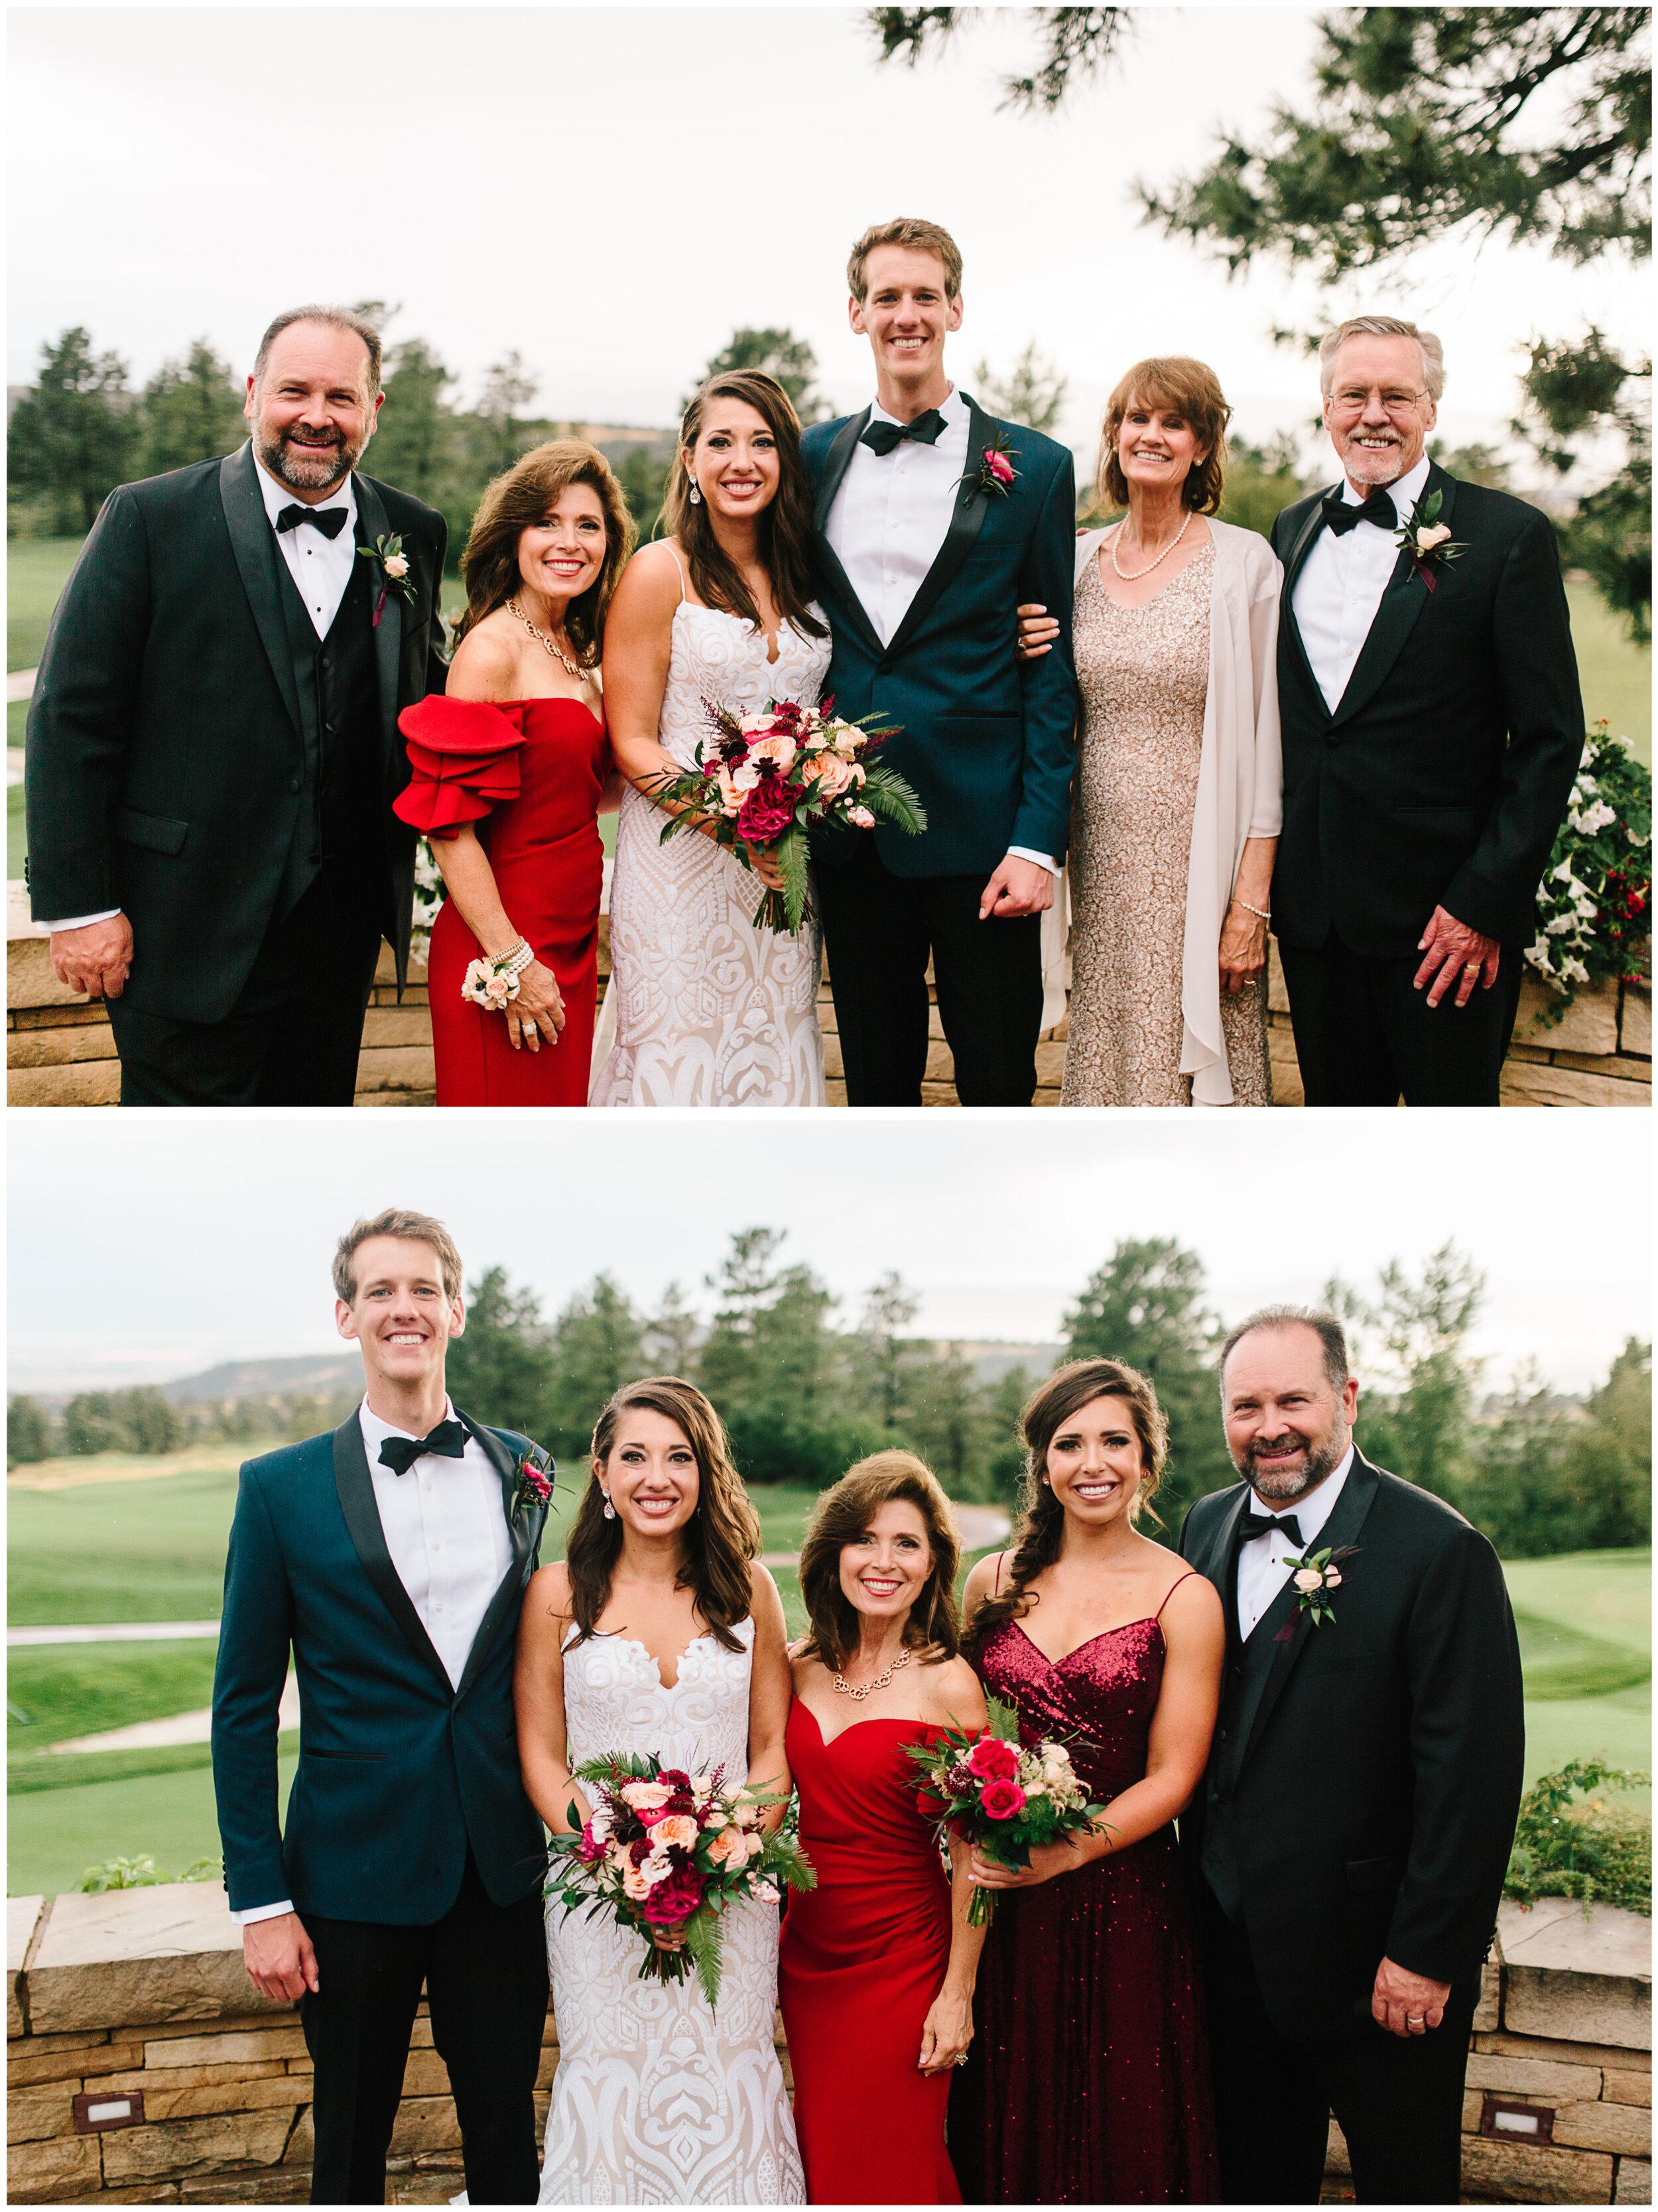 sanctuary_wedding_64.jpg